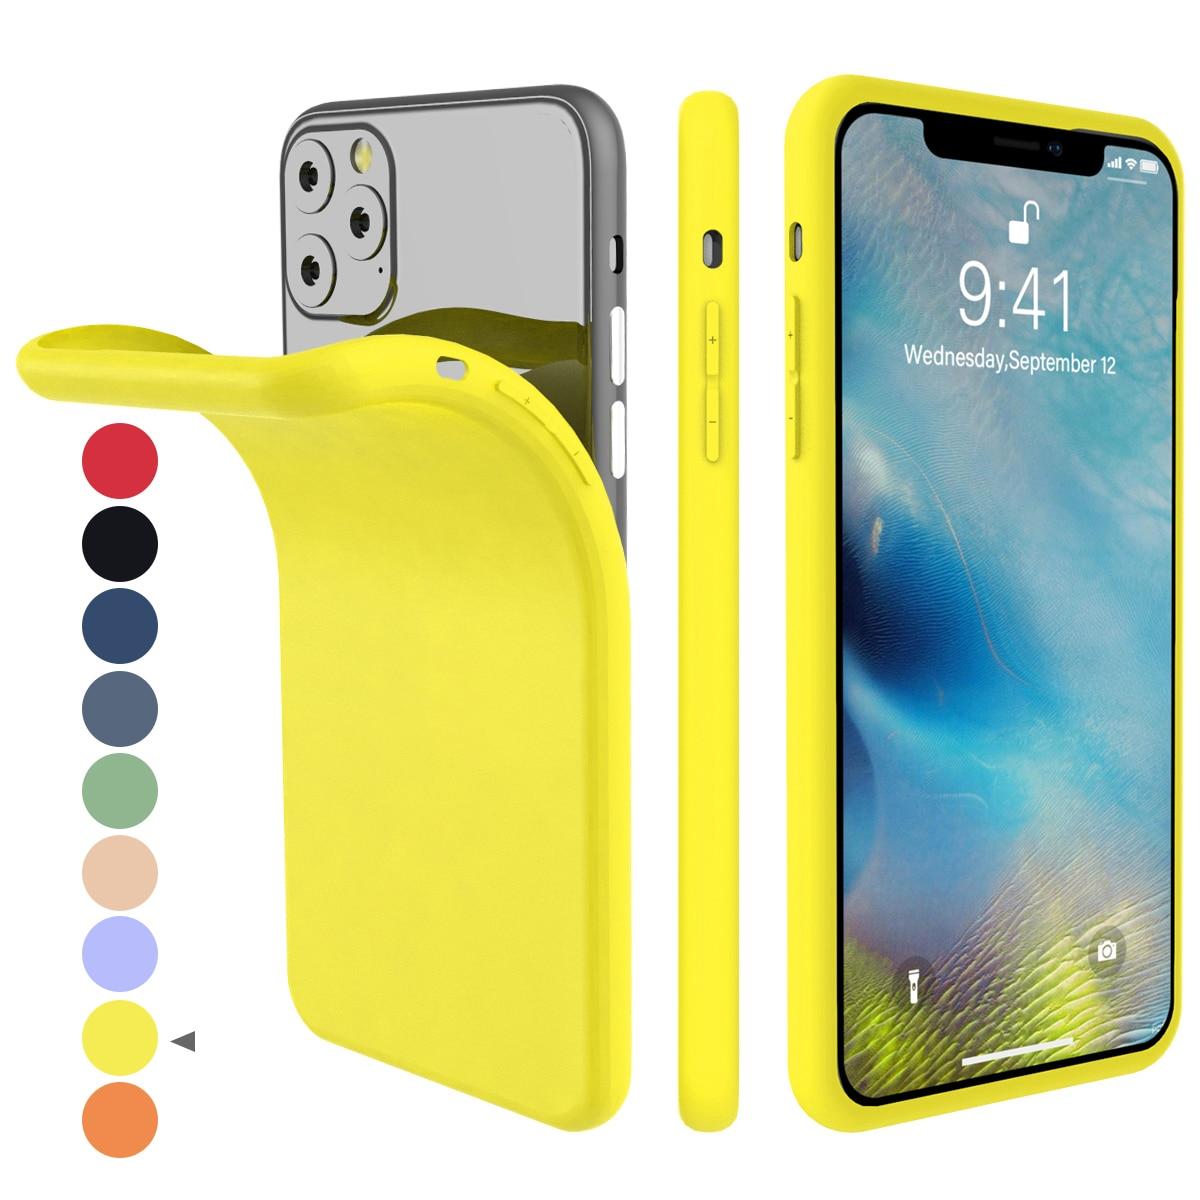 Torubia Silicone Case for iPhone 11/11 Pro/11 Pro Max 38